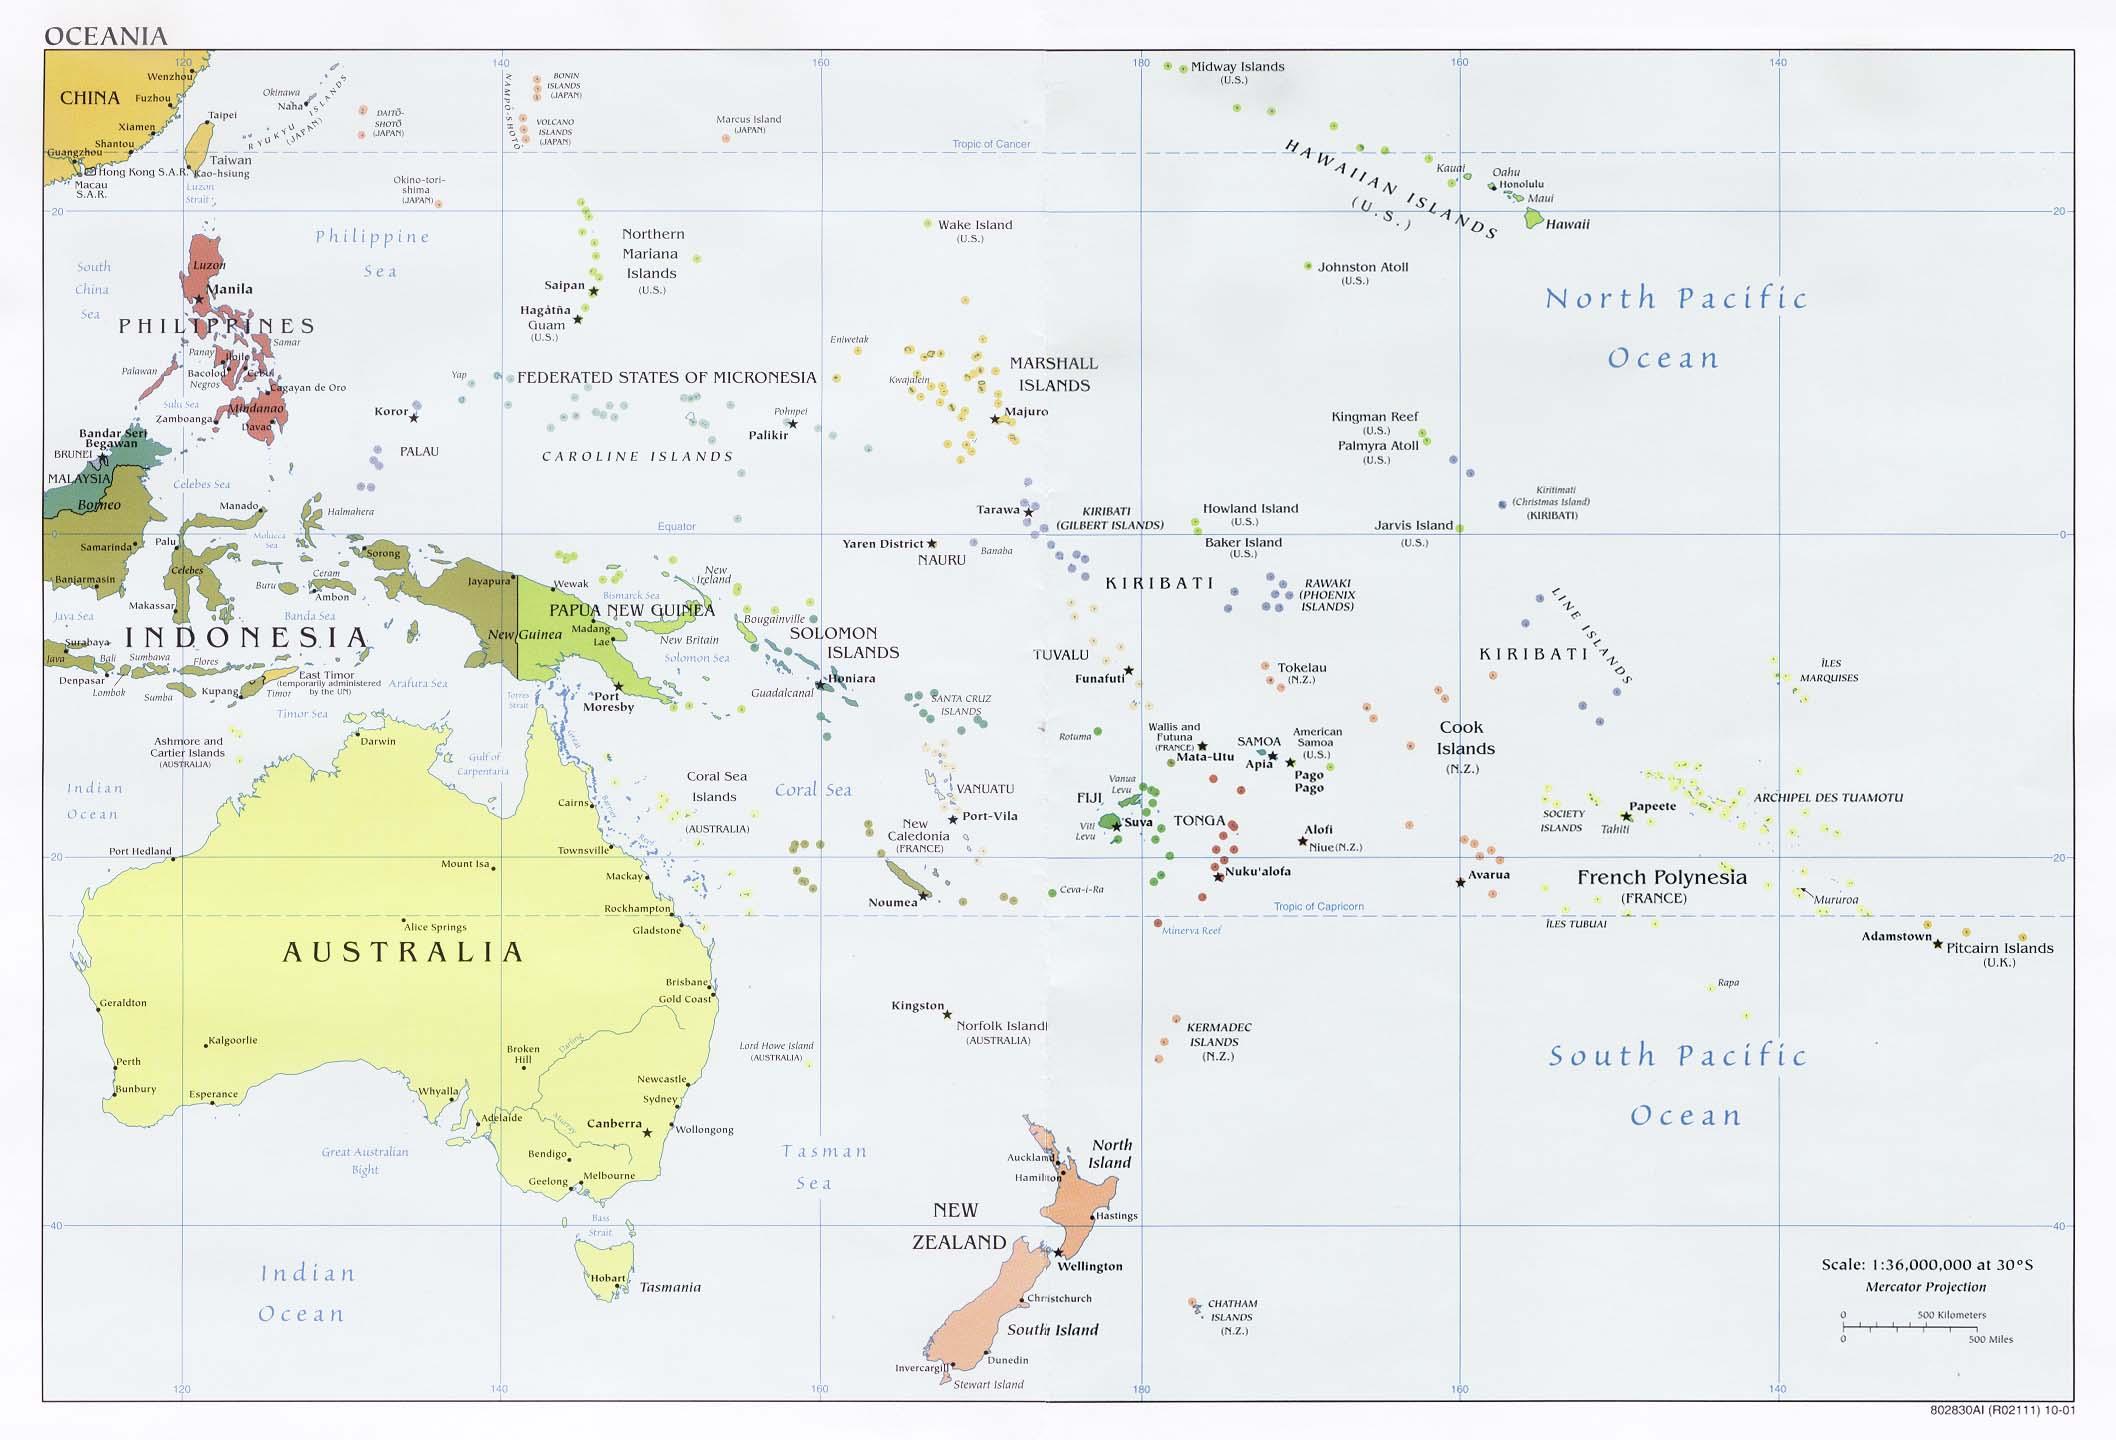 oceania-map-australia-new-zealand.jpg